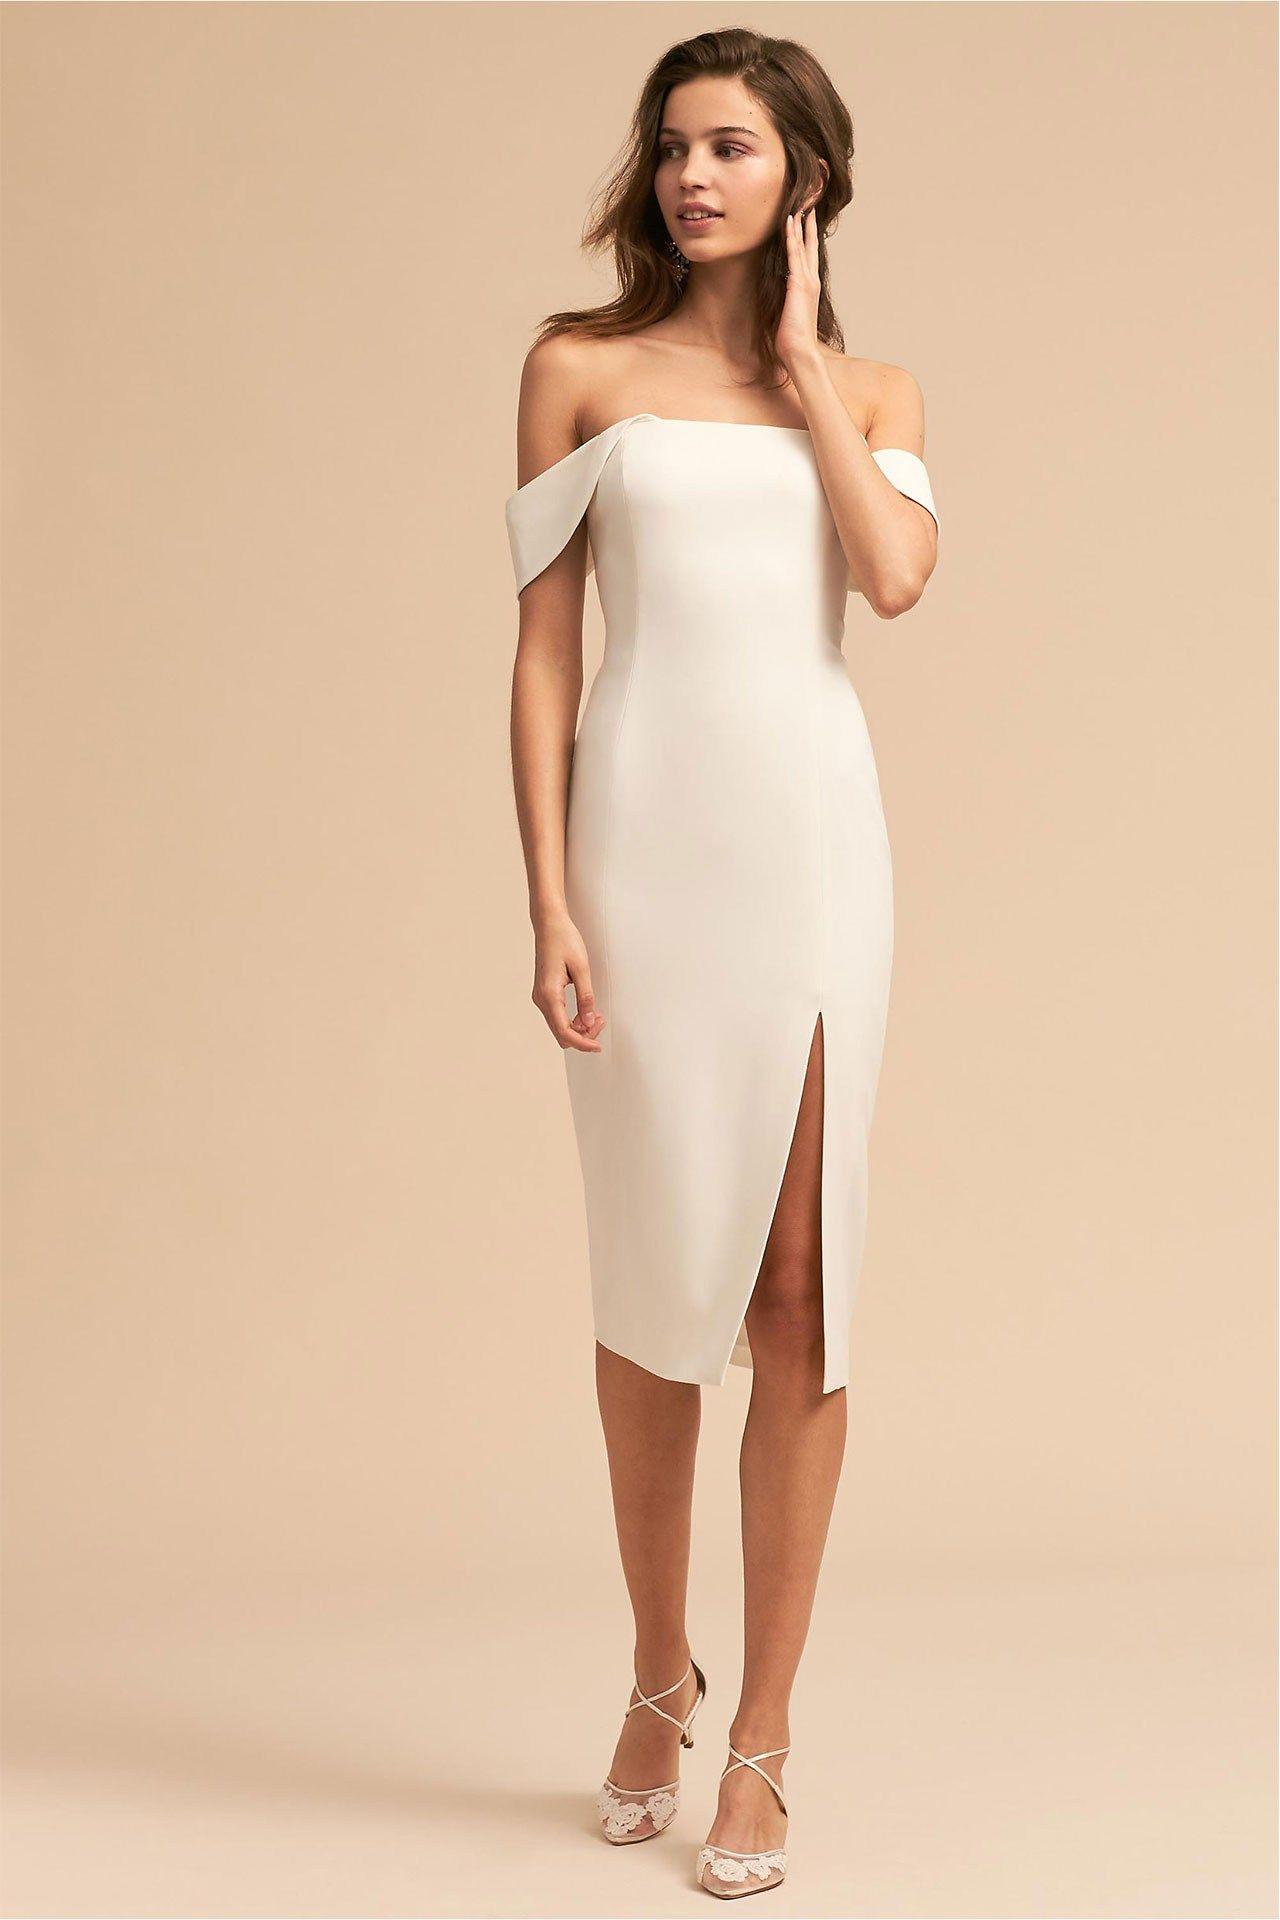 36 Beautiful Wedding Dresses For A Registry Do | Pinterest ...